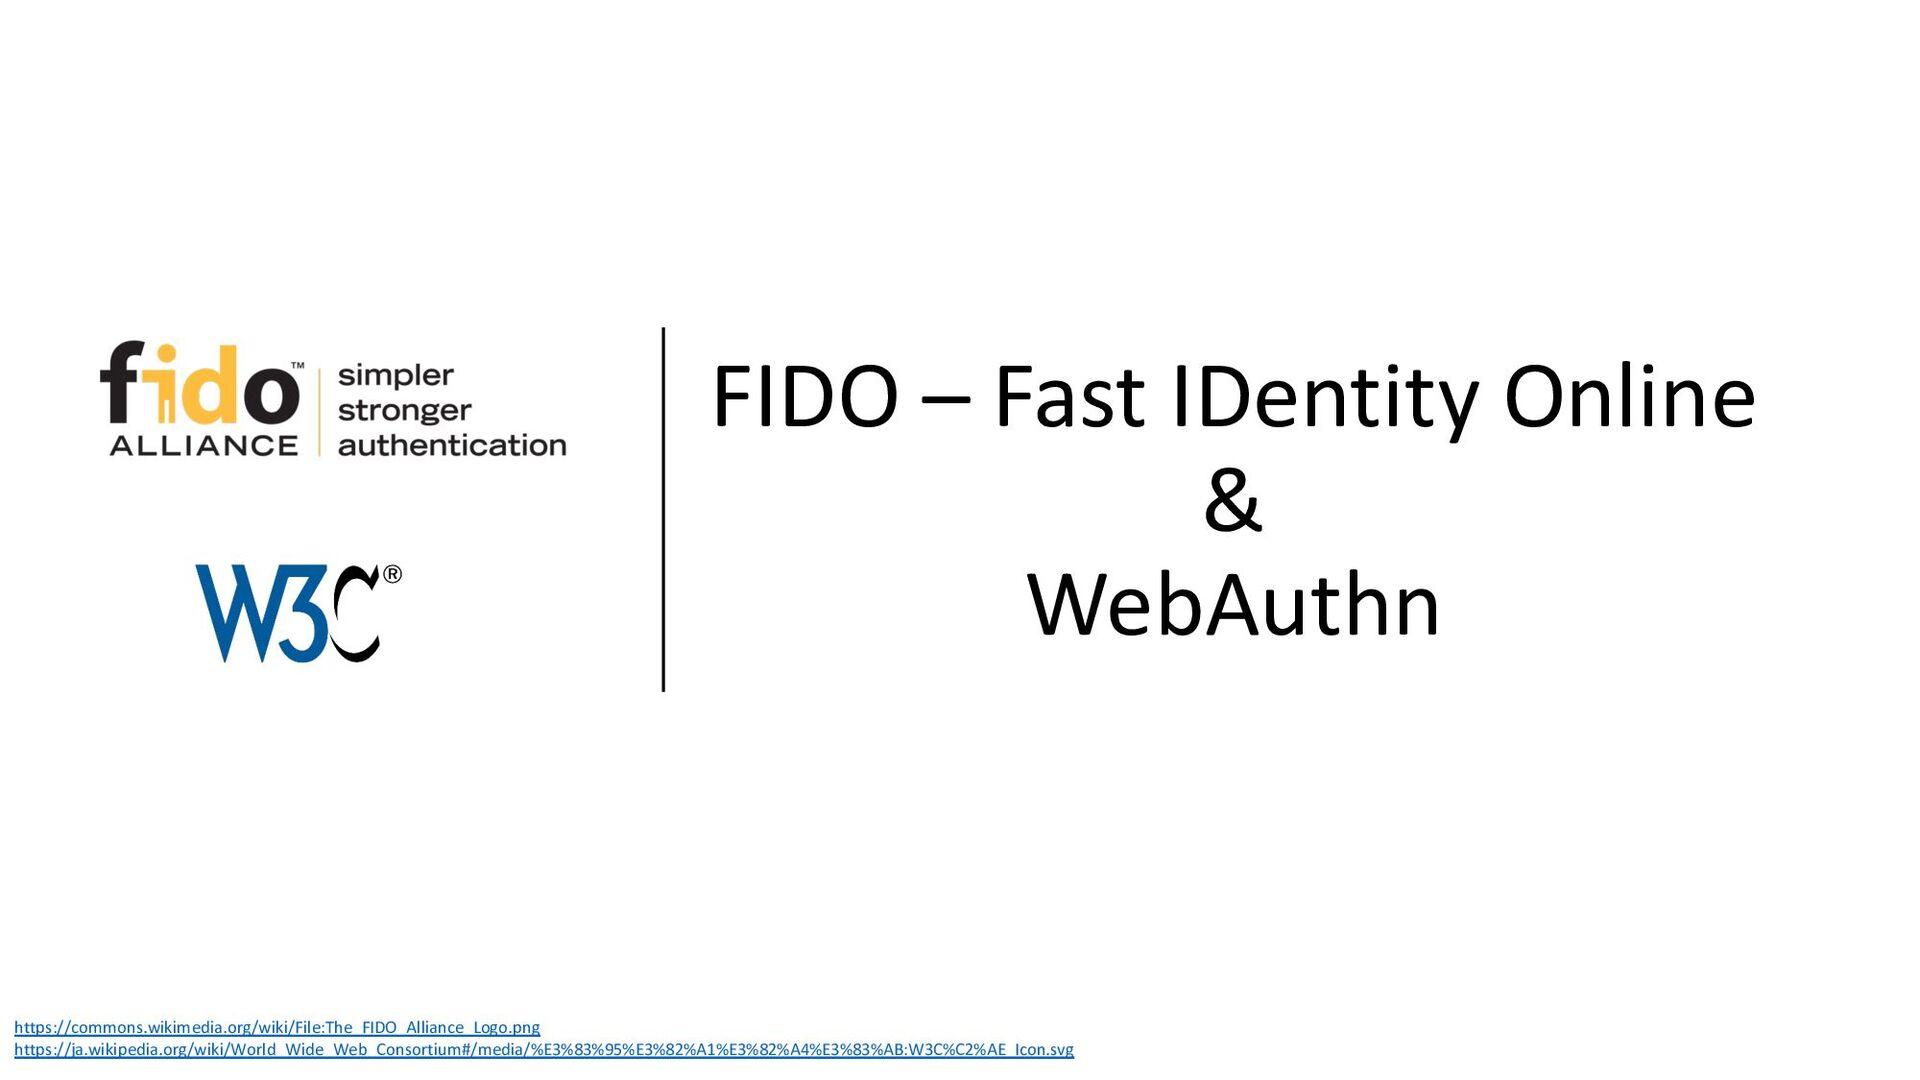 https://docs.microsoft.com/ja-jp/office365/admi...